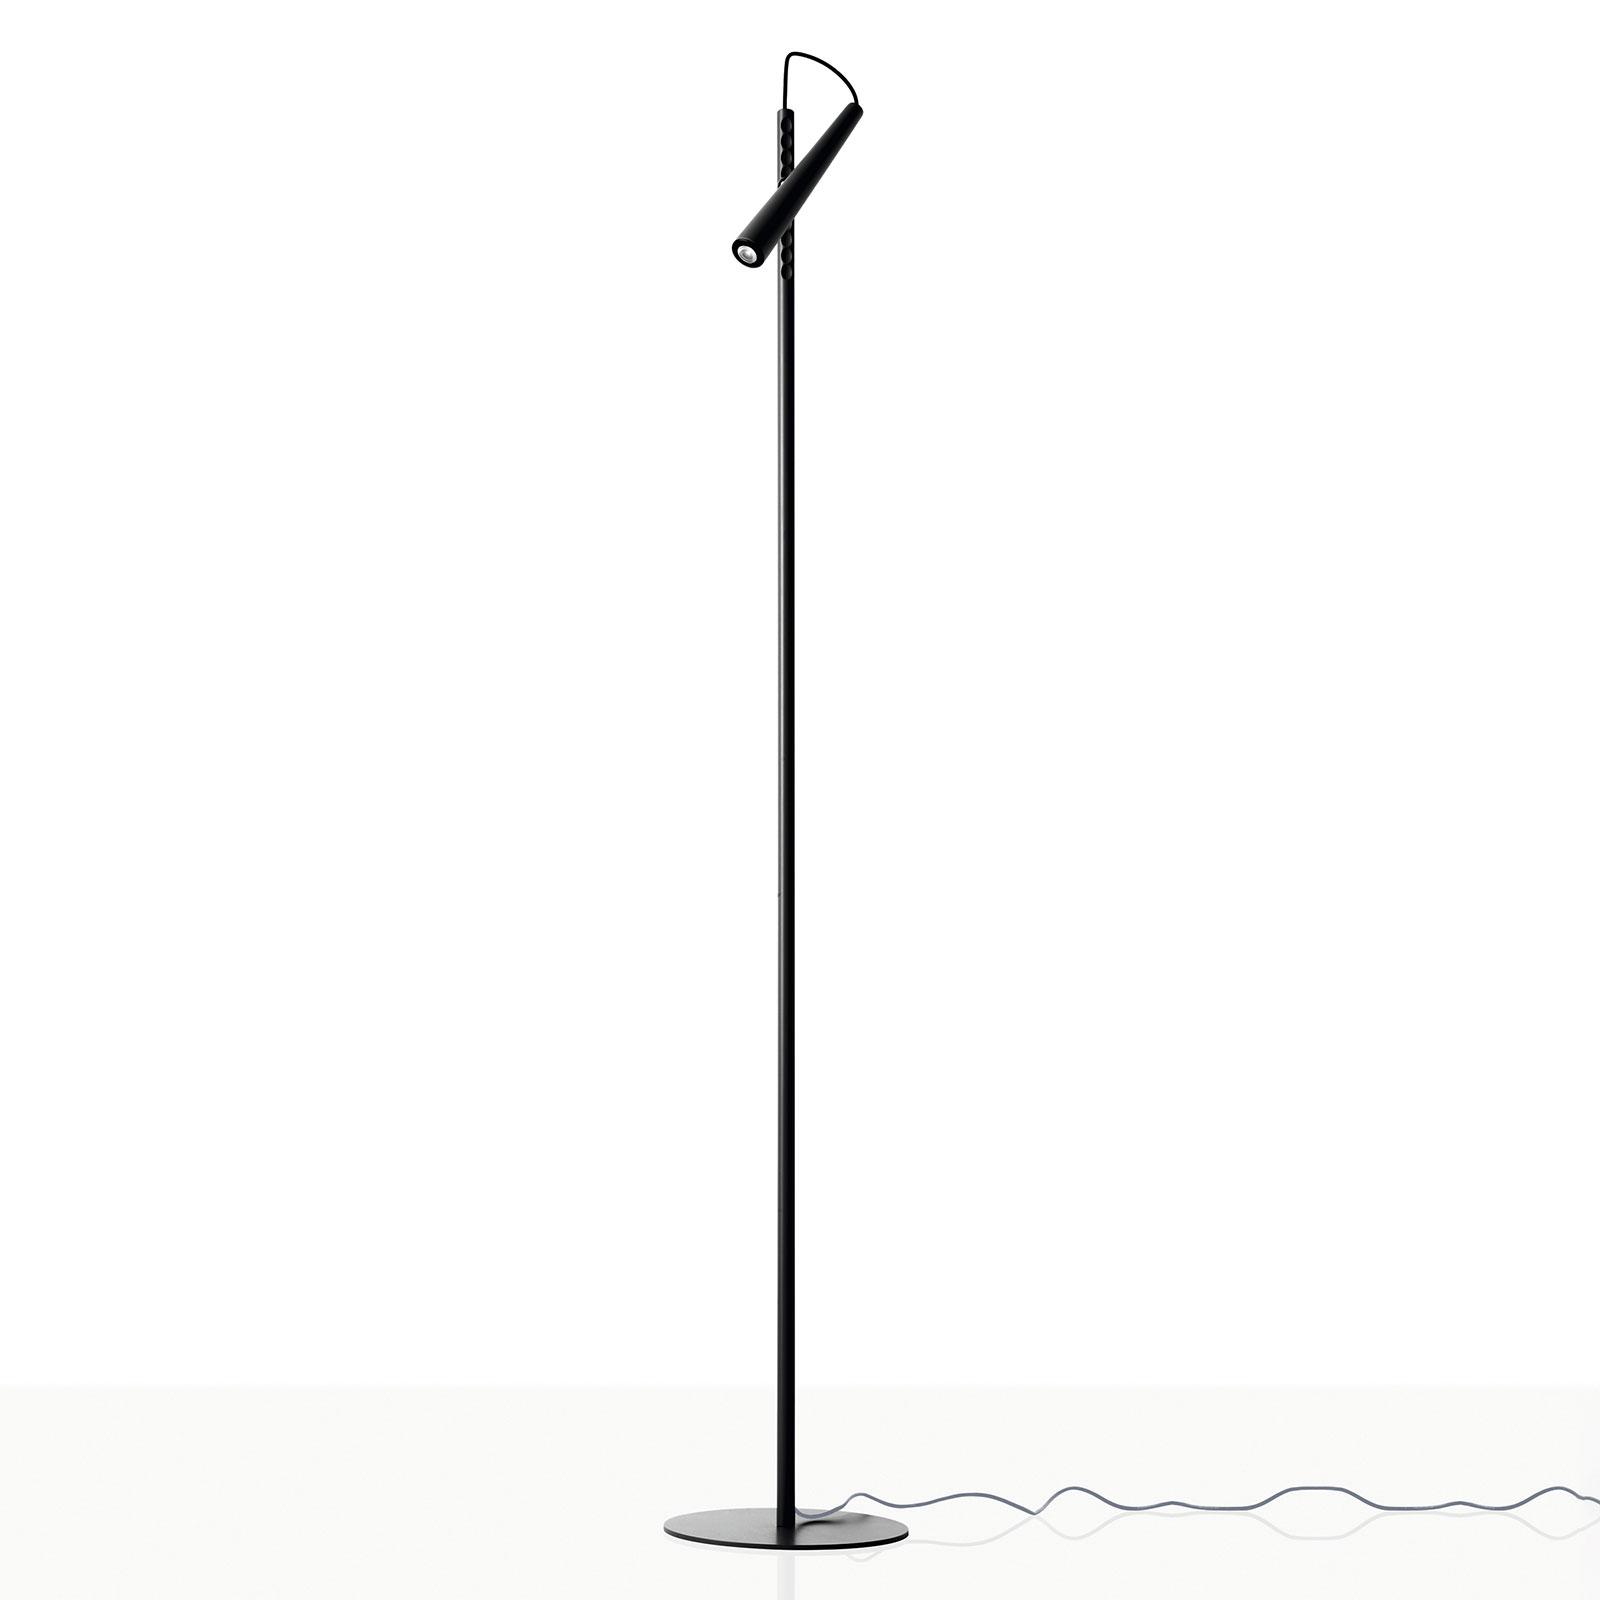 Foscarini Magneto lampa stojąca LED, czarna